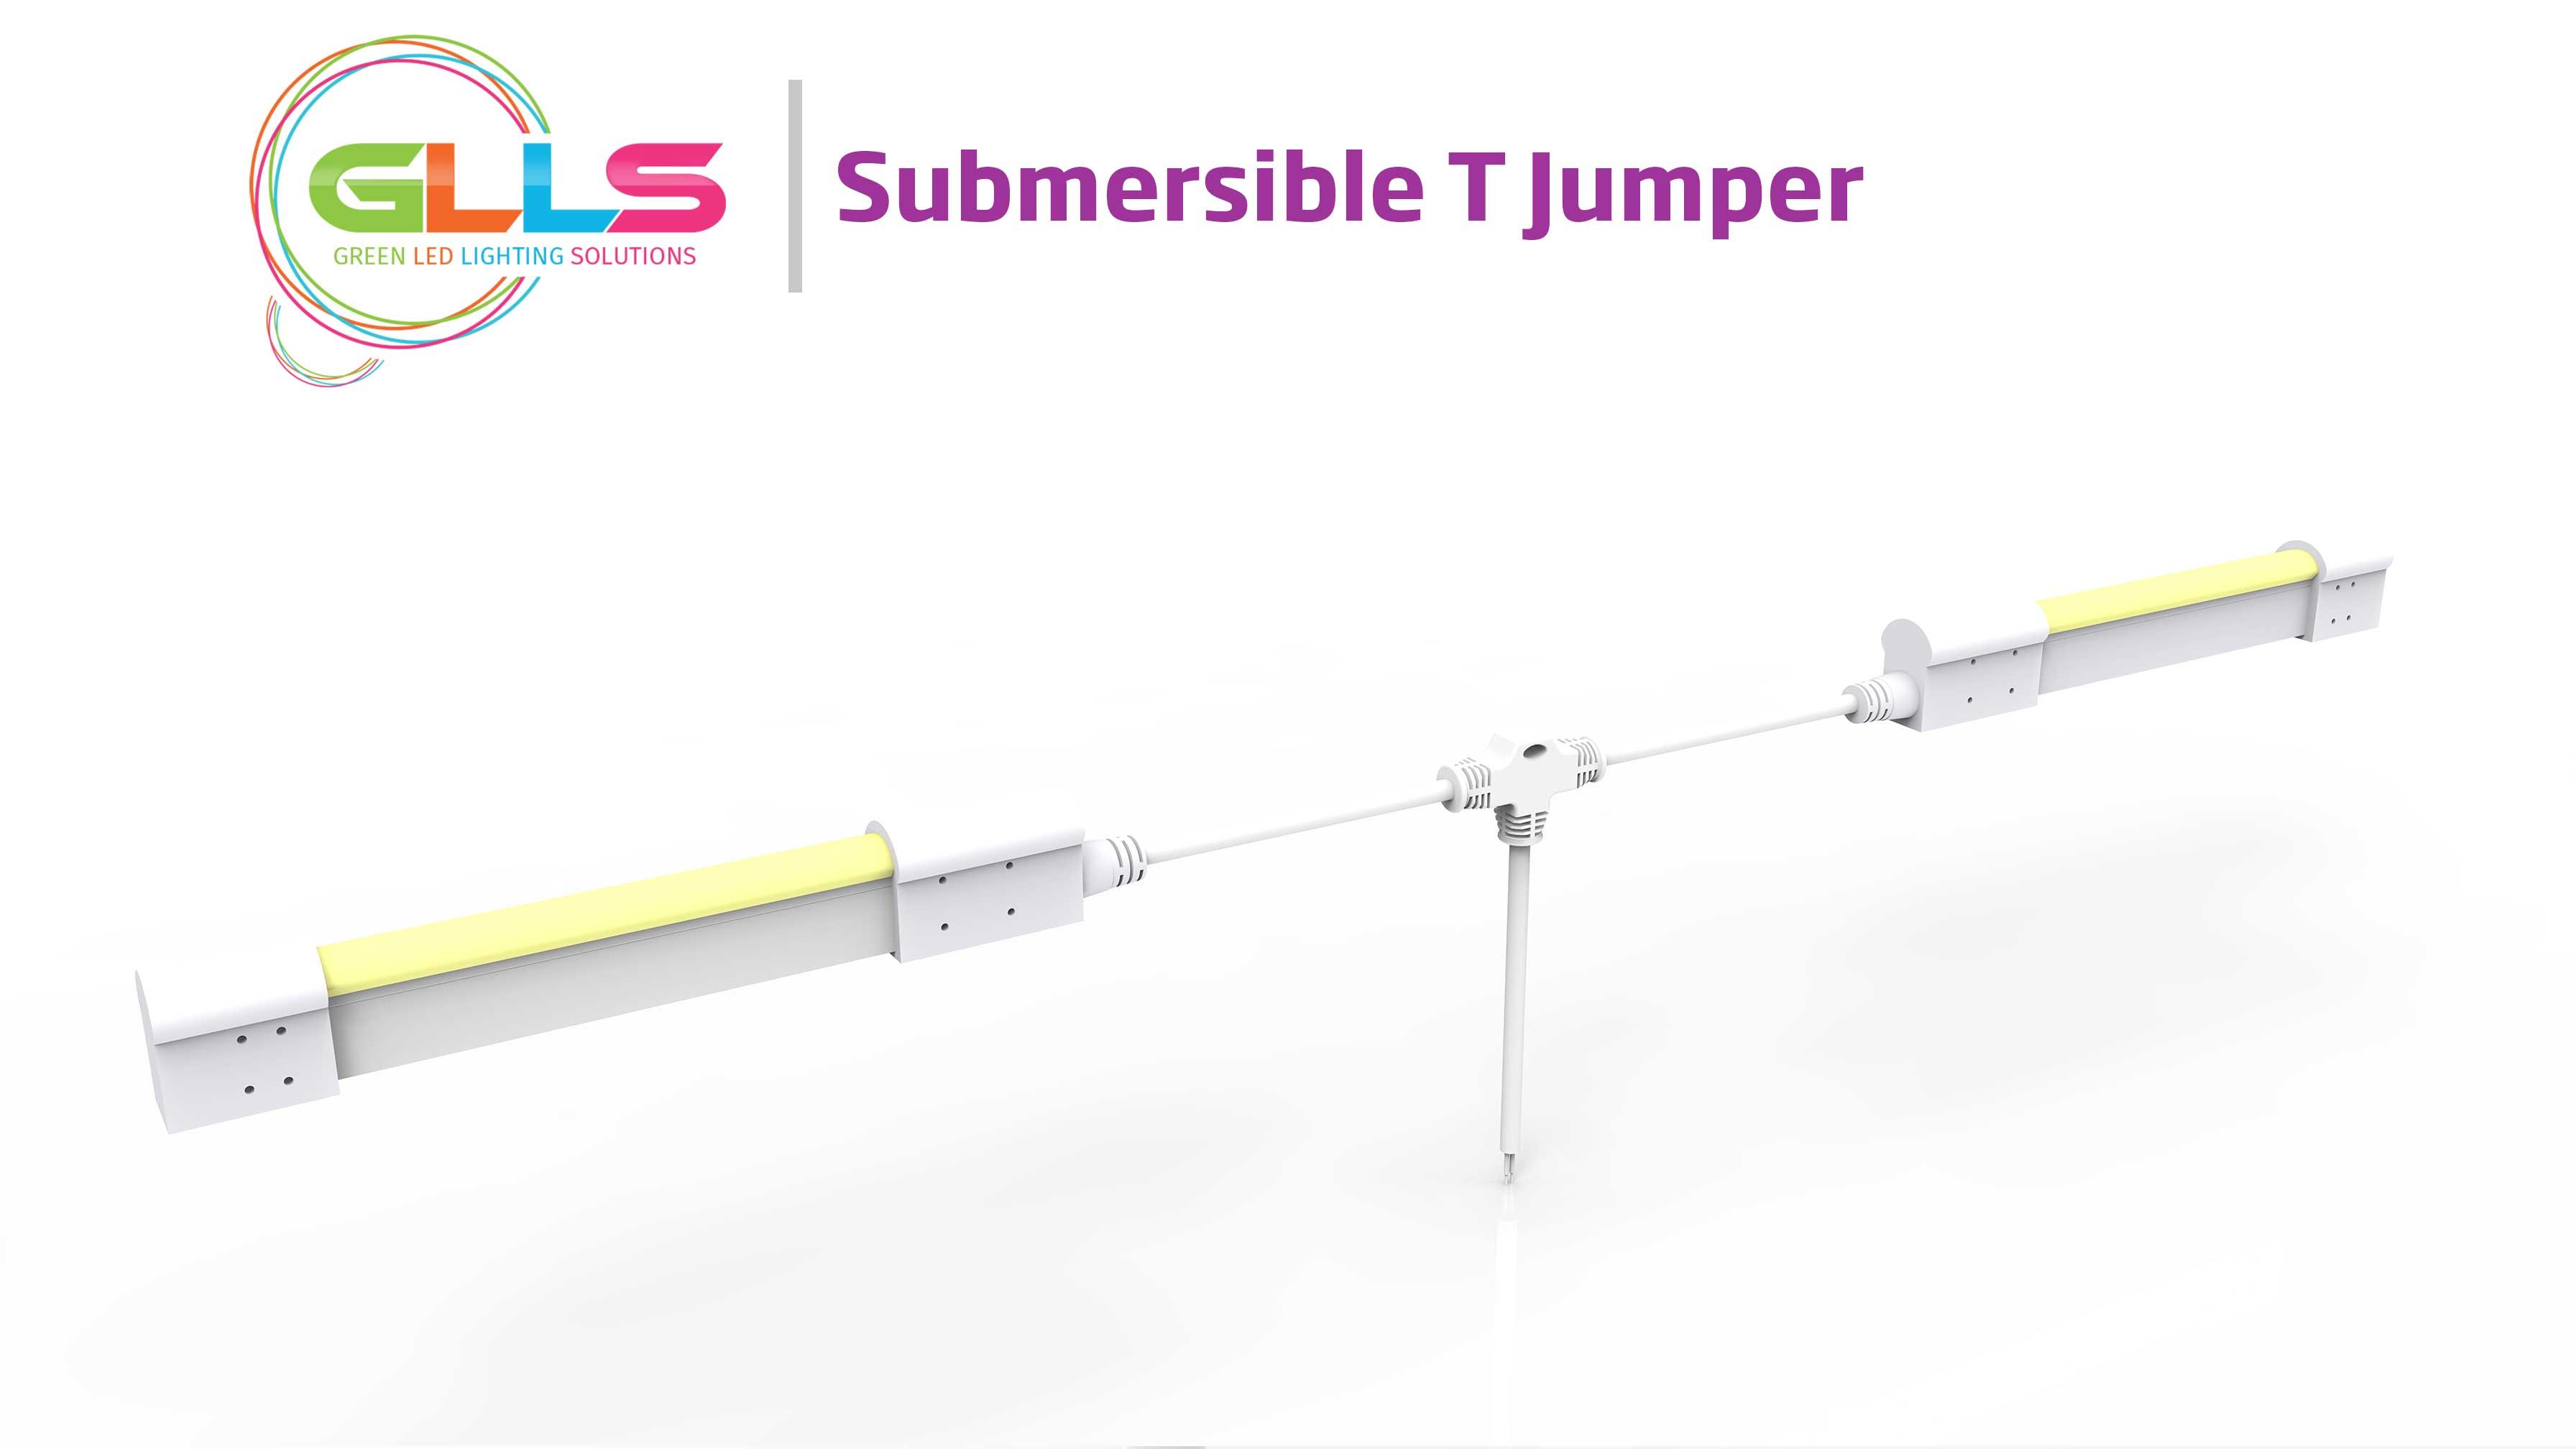 Vivid-S270-Submersible-T-Jumper